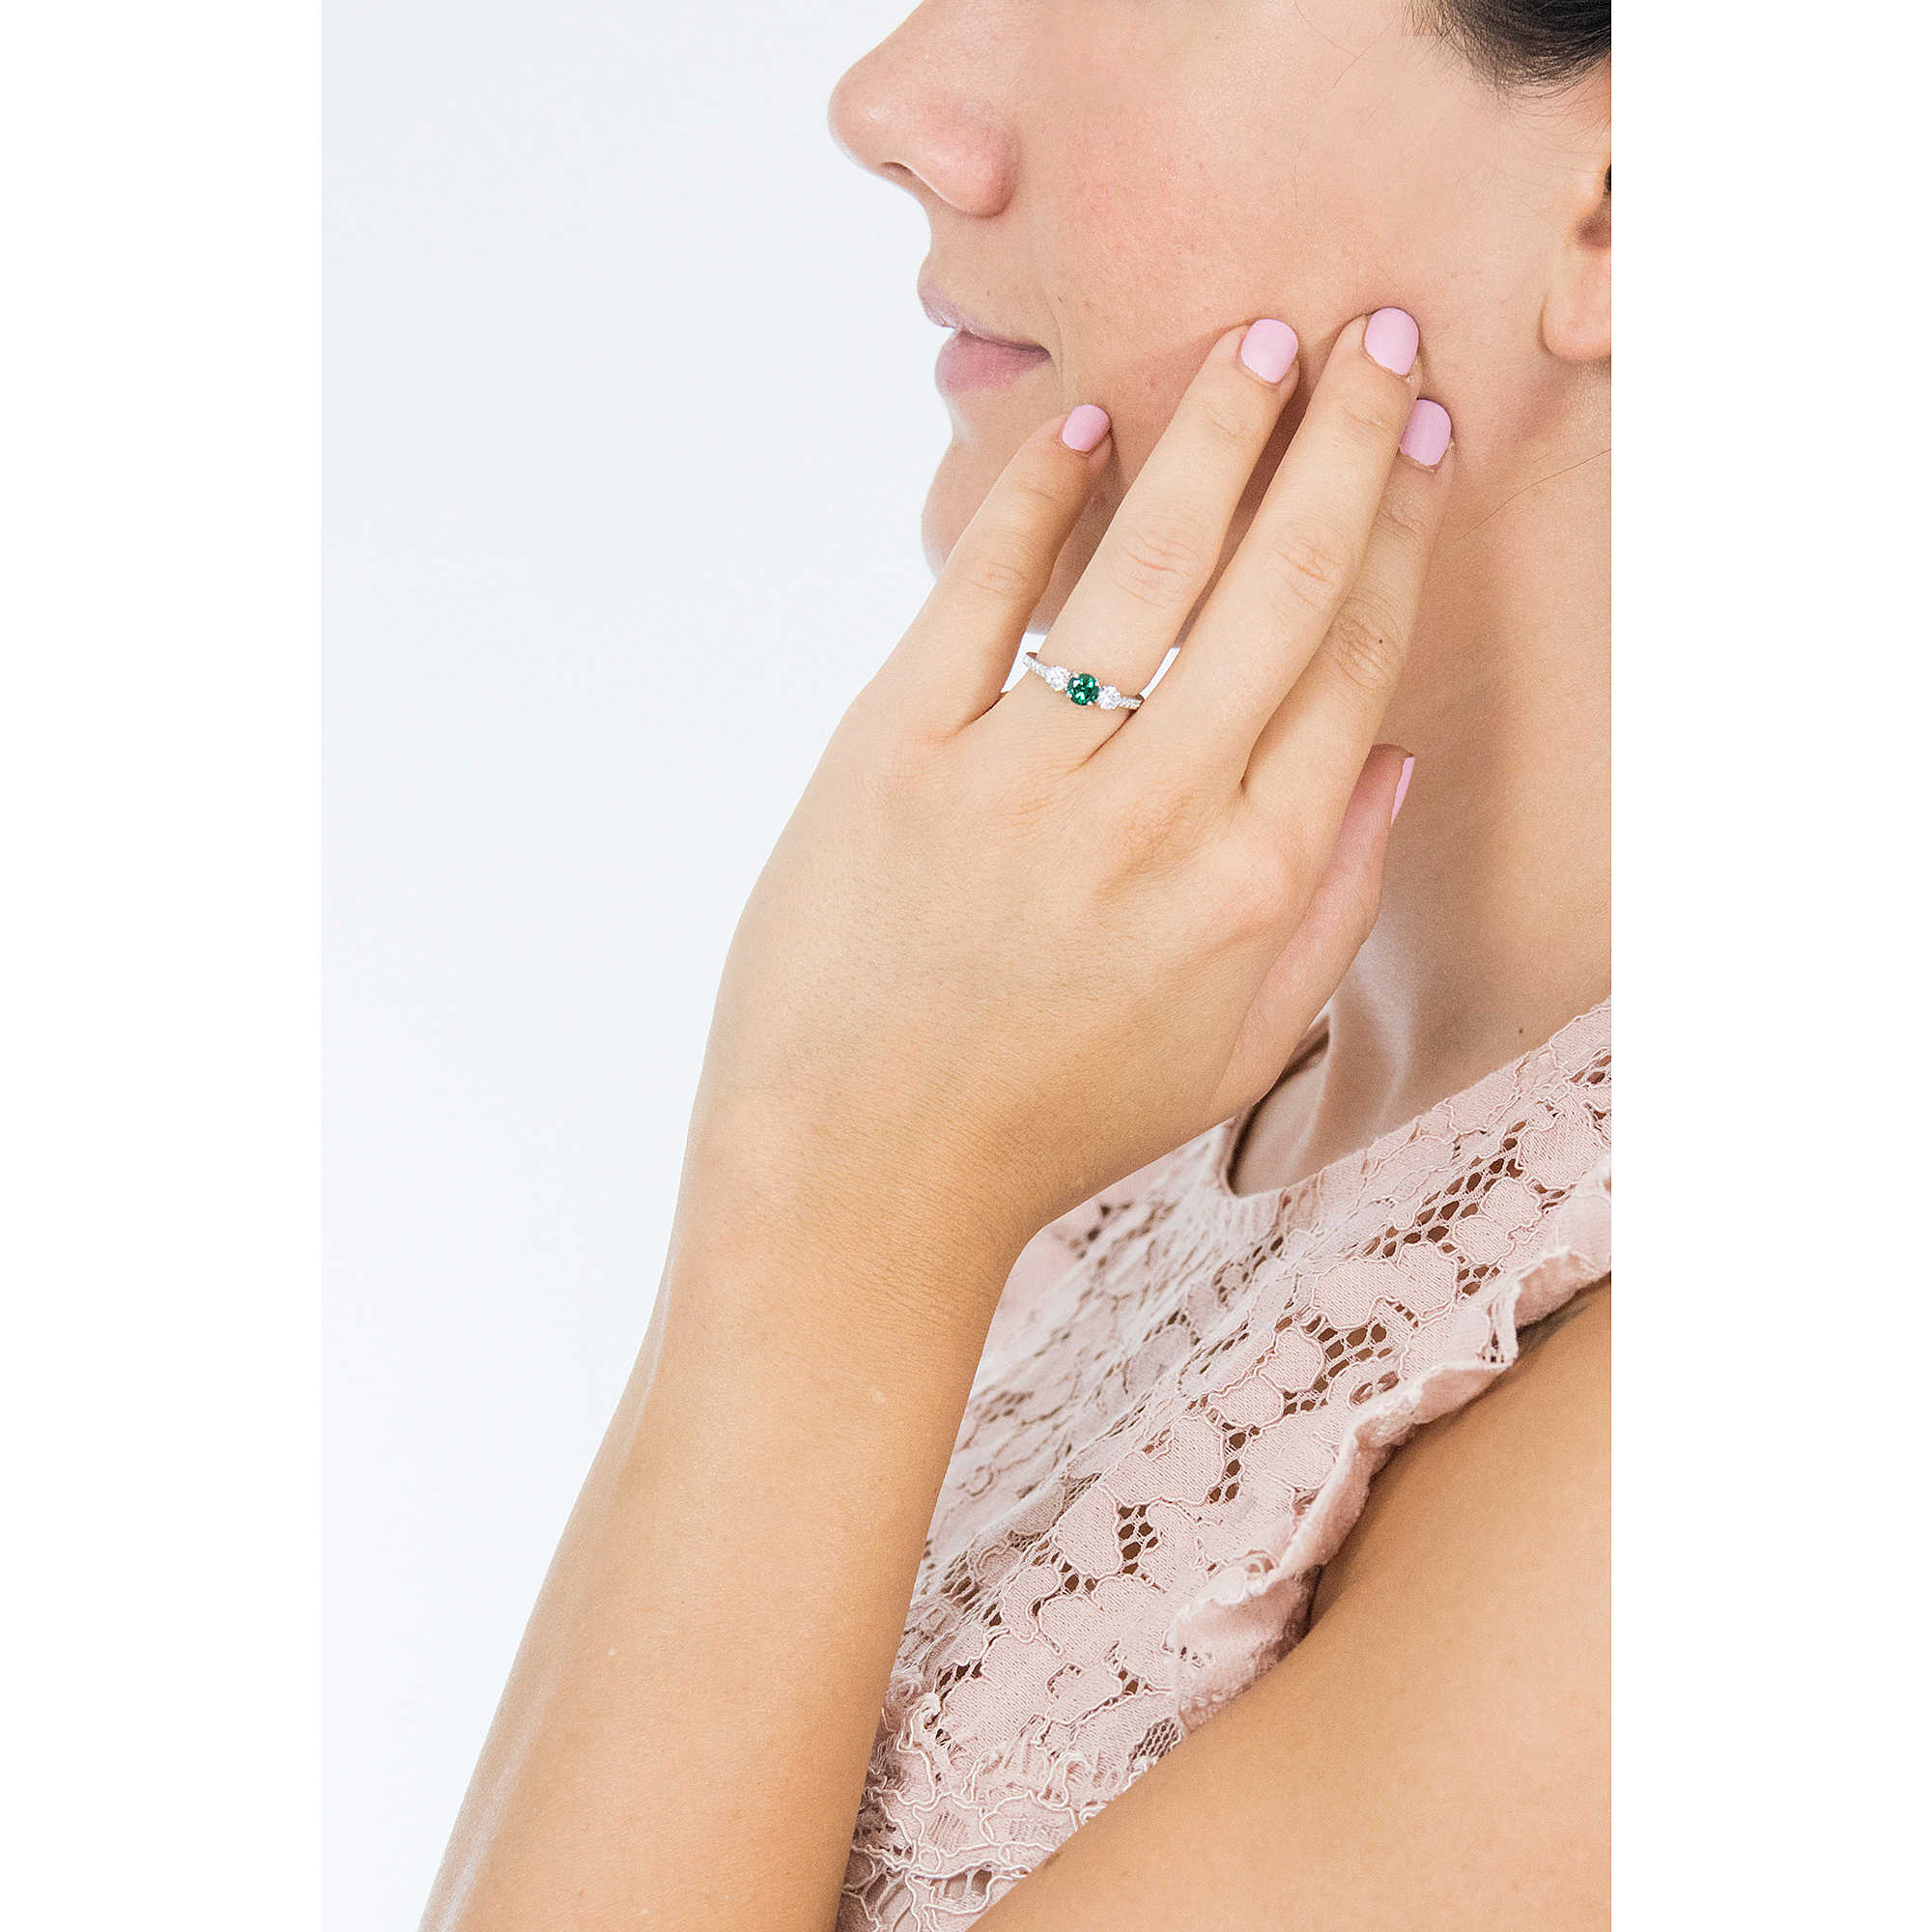 ring woman jewellery Swarovski Attract Trilogy 5448893 rings Swarovski 39967c48df